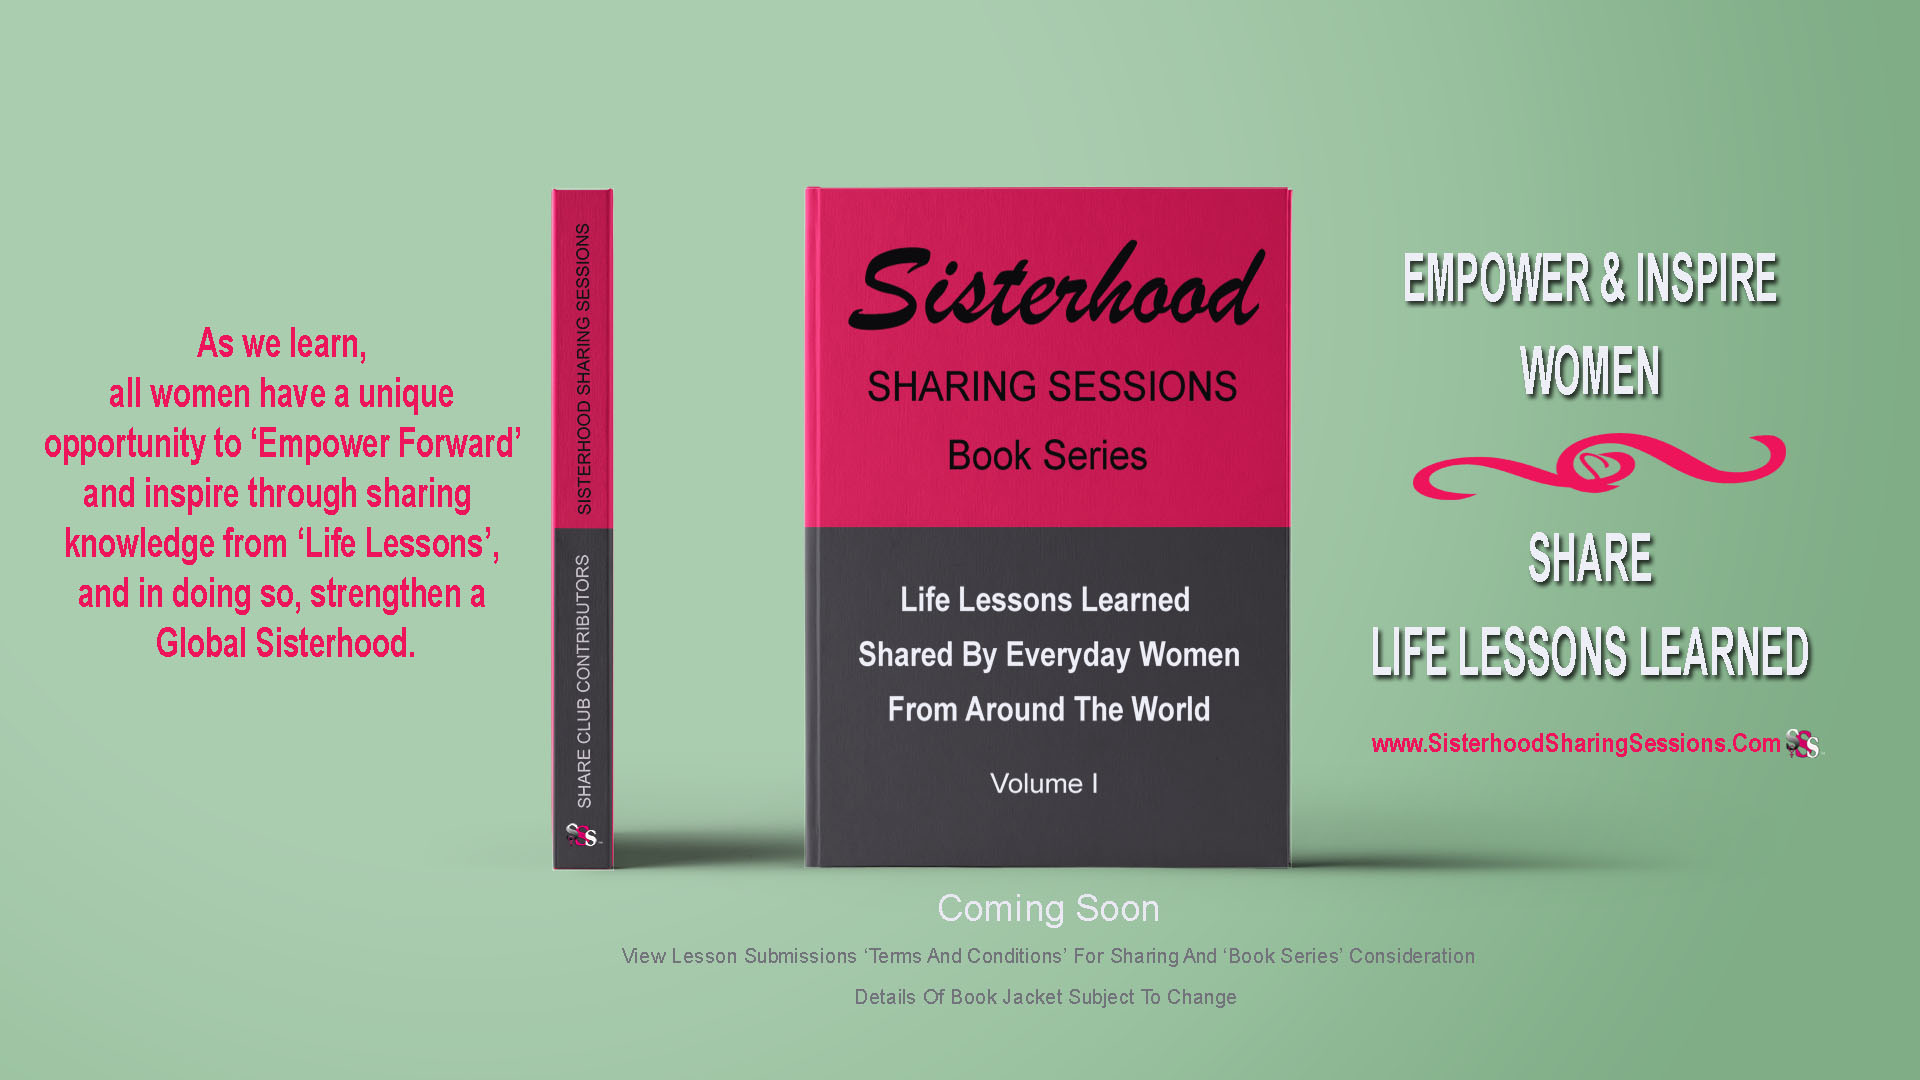 Sisterhood Sharing Sessions Book Series